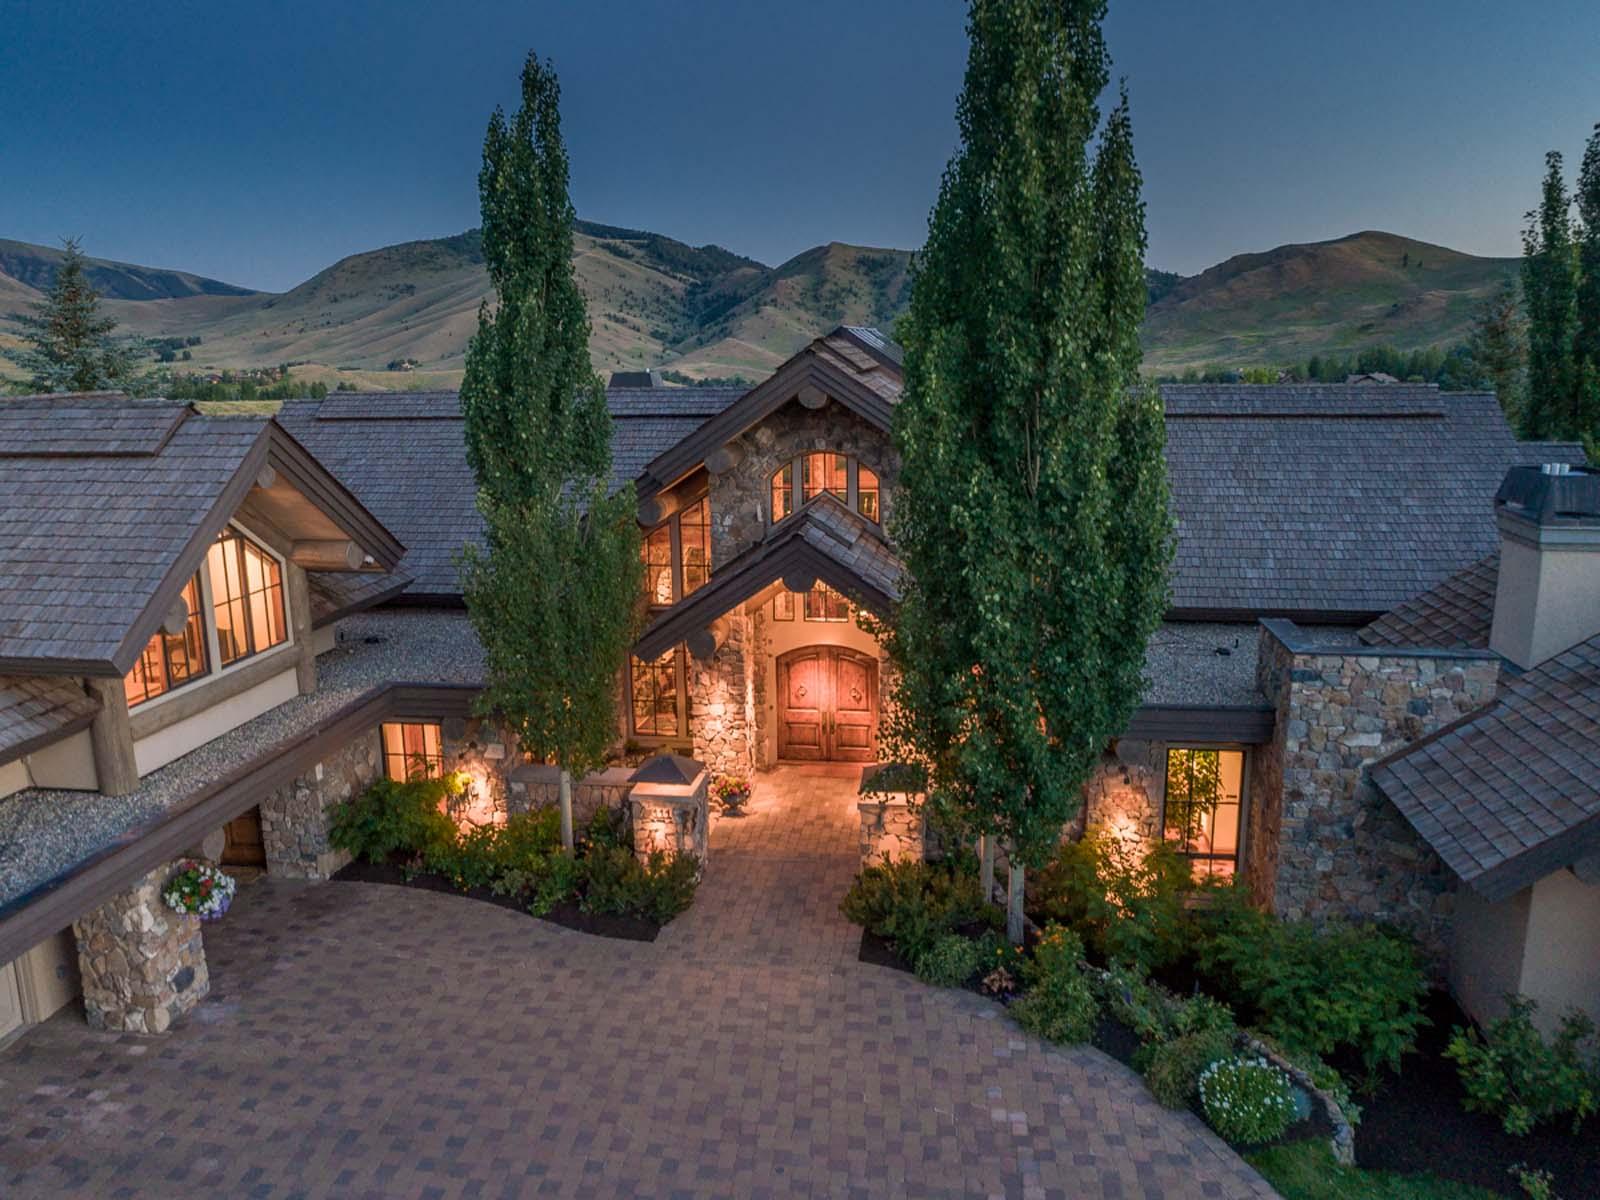 Villa per Vendita alle ore Luxury Sun Valley Estate 111 Sagewillow Rd Sun Valley, Idaho, 83353 Stati Uniti